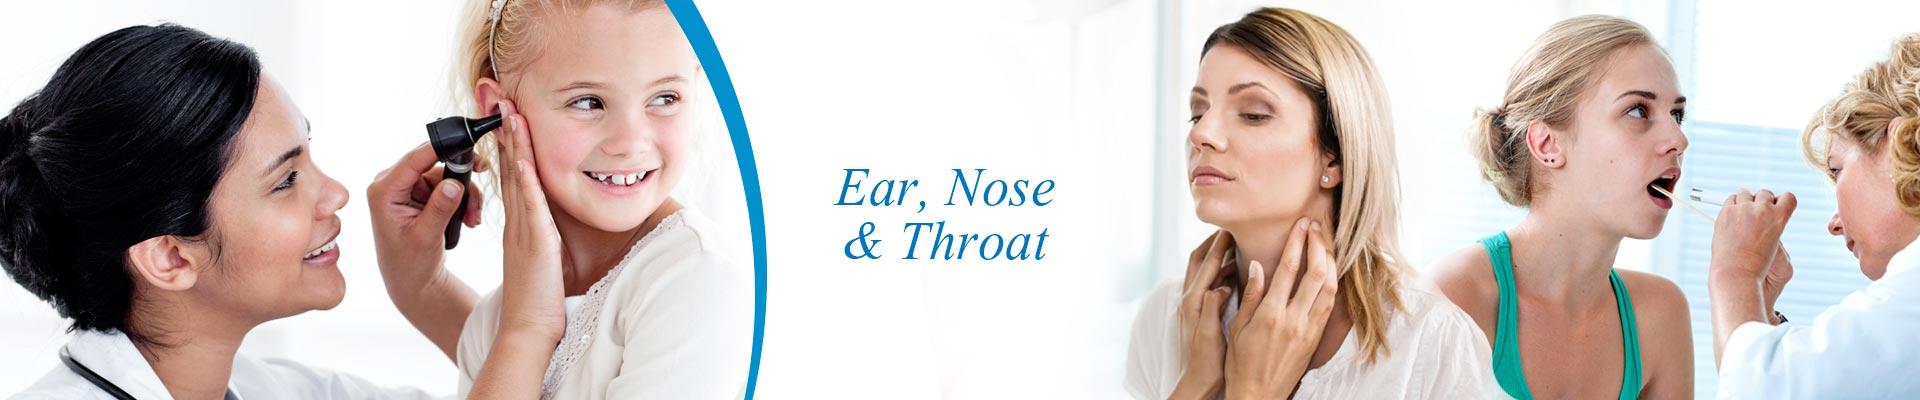 Ear, Nose & Throat - Associated Coastal ENT